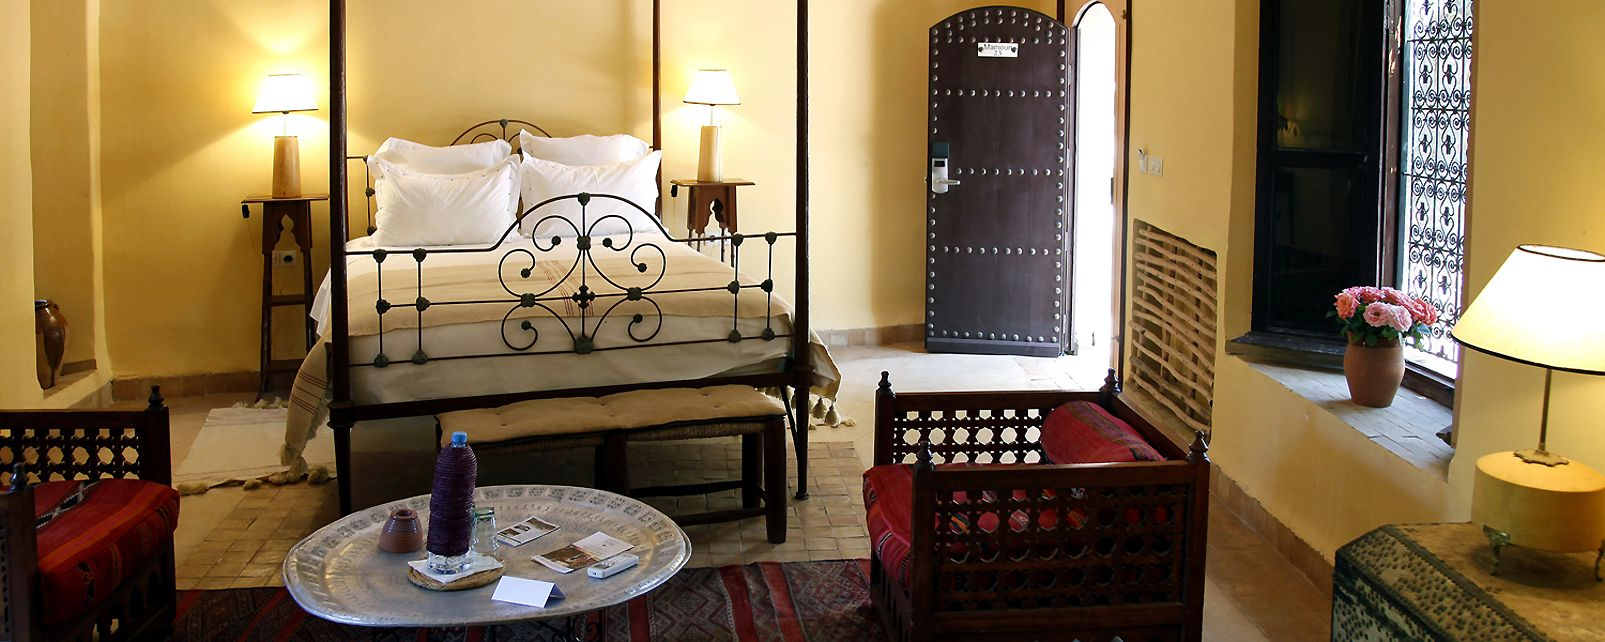 Hotel Hôtel By Beldi